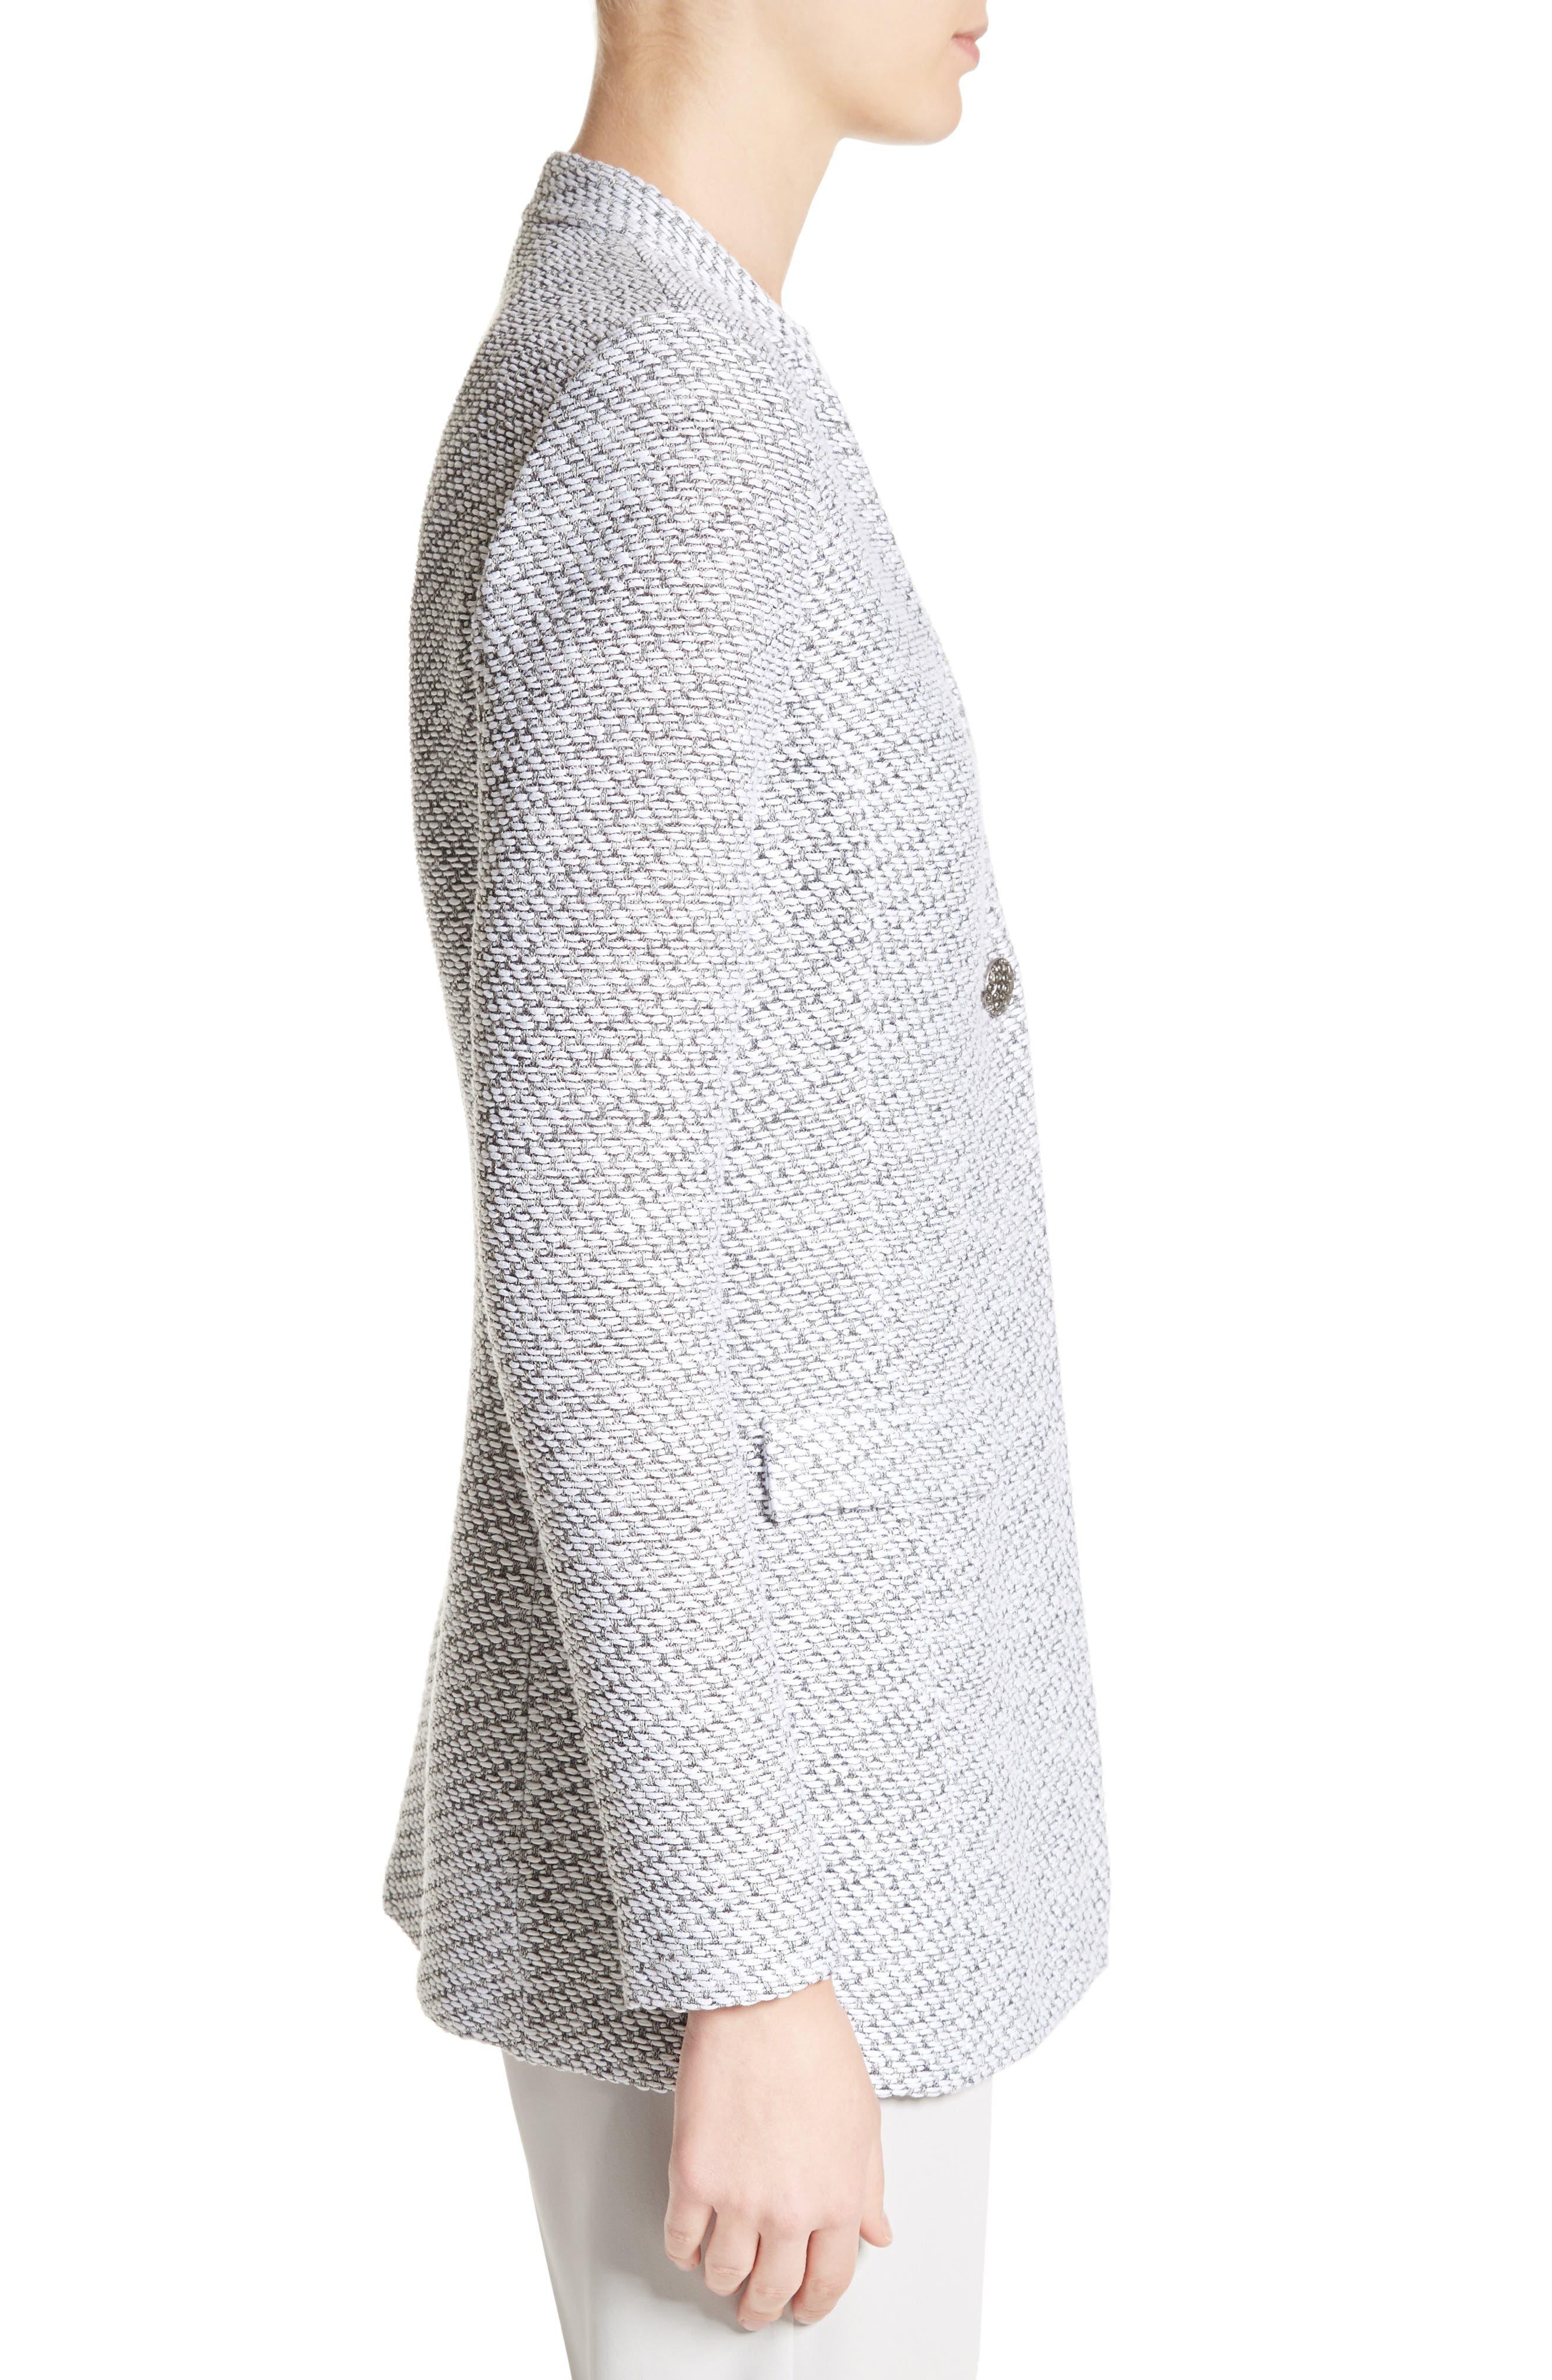 Gyan Knit Jacket,                             Alternate thumbnail 3, color,                             020